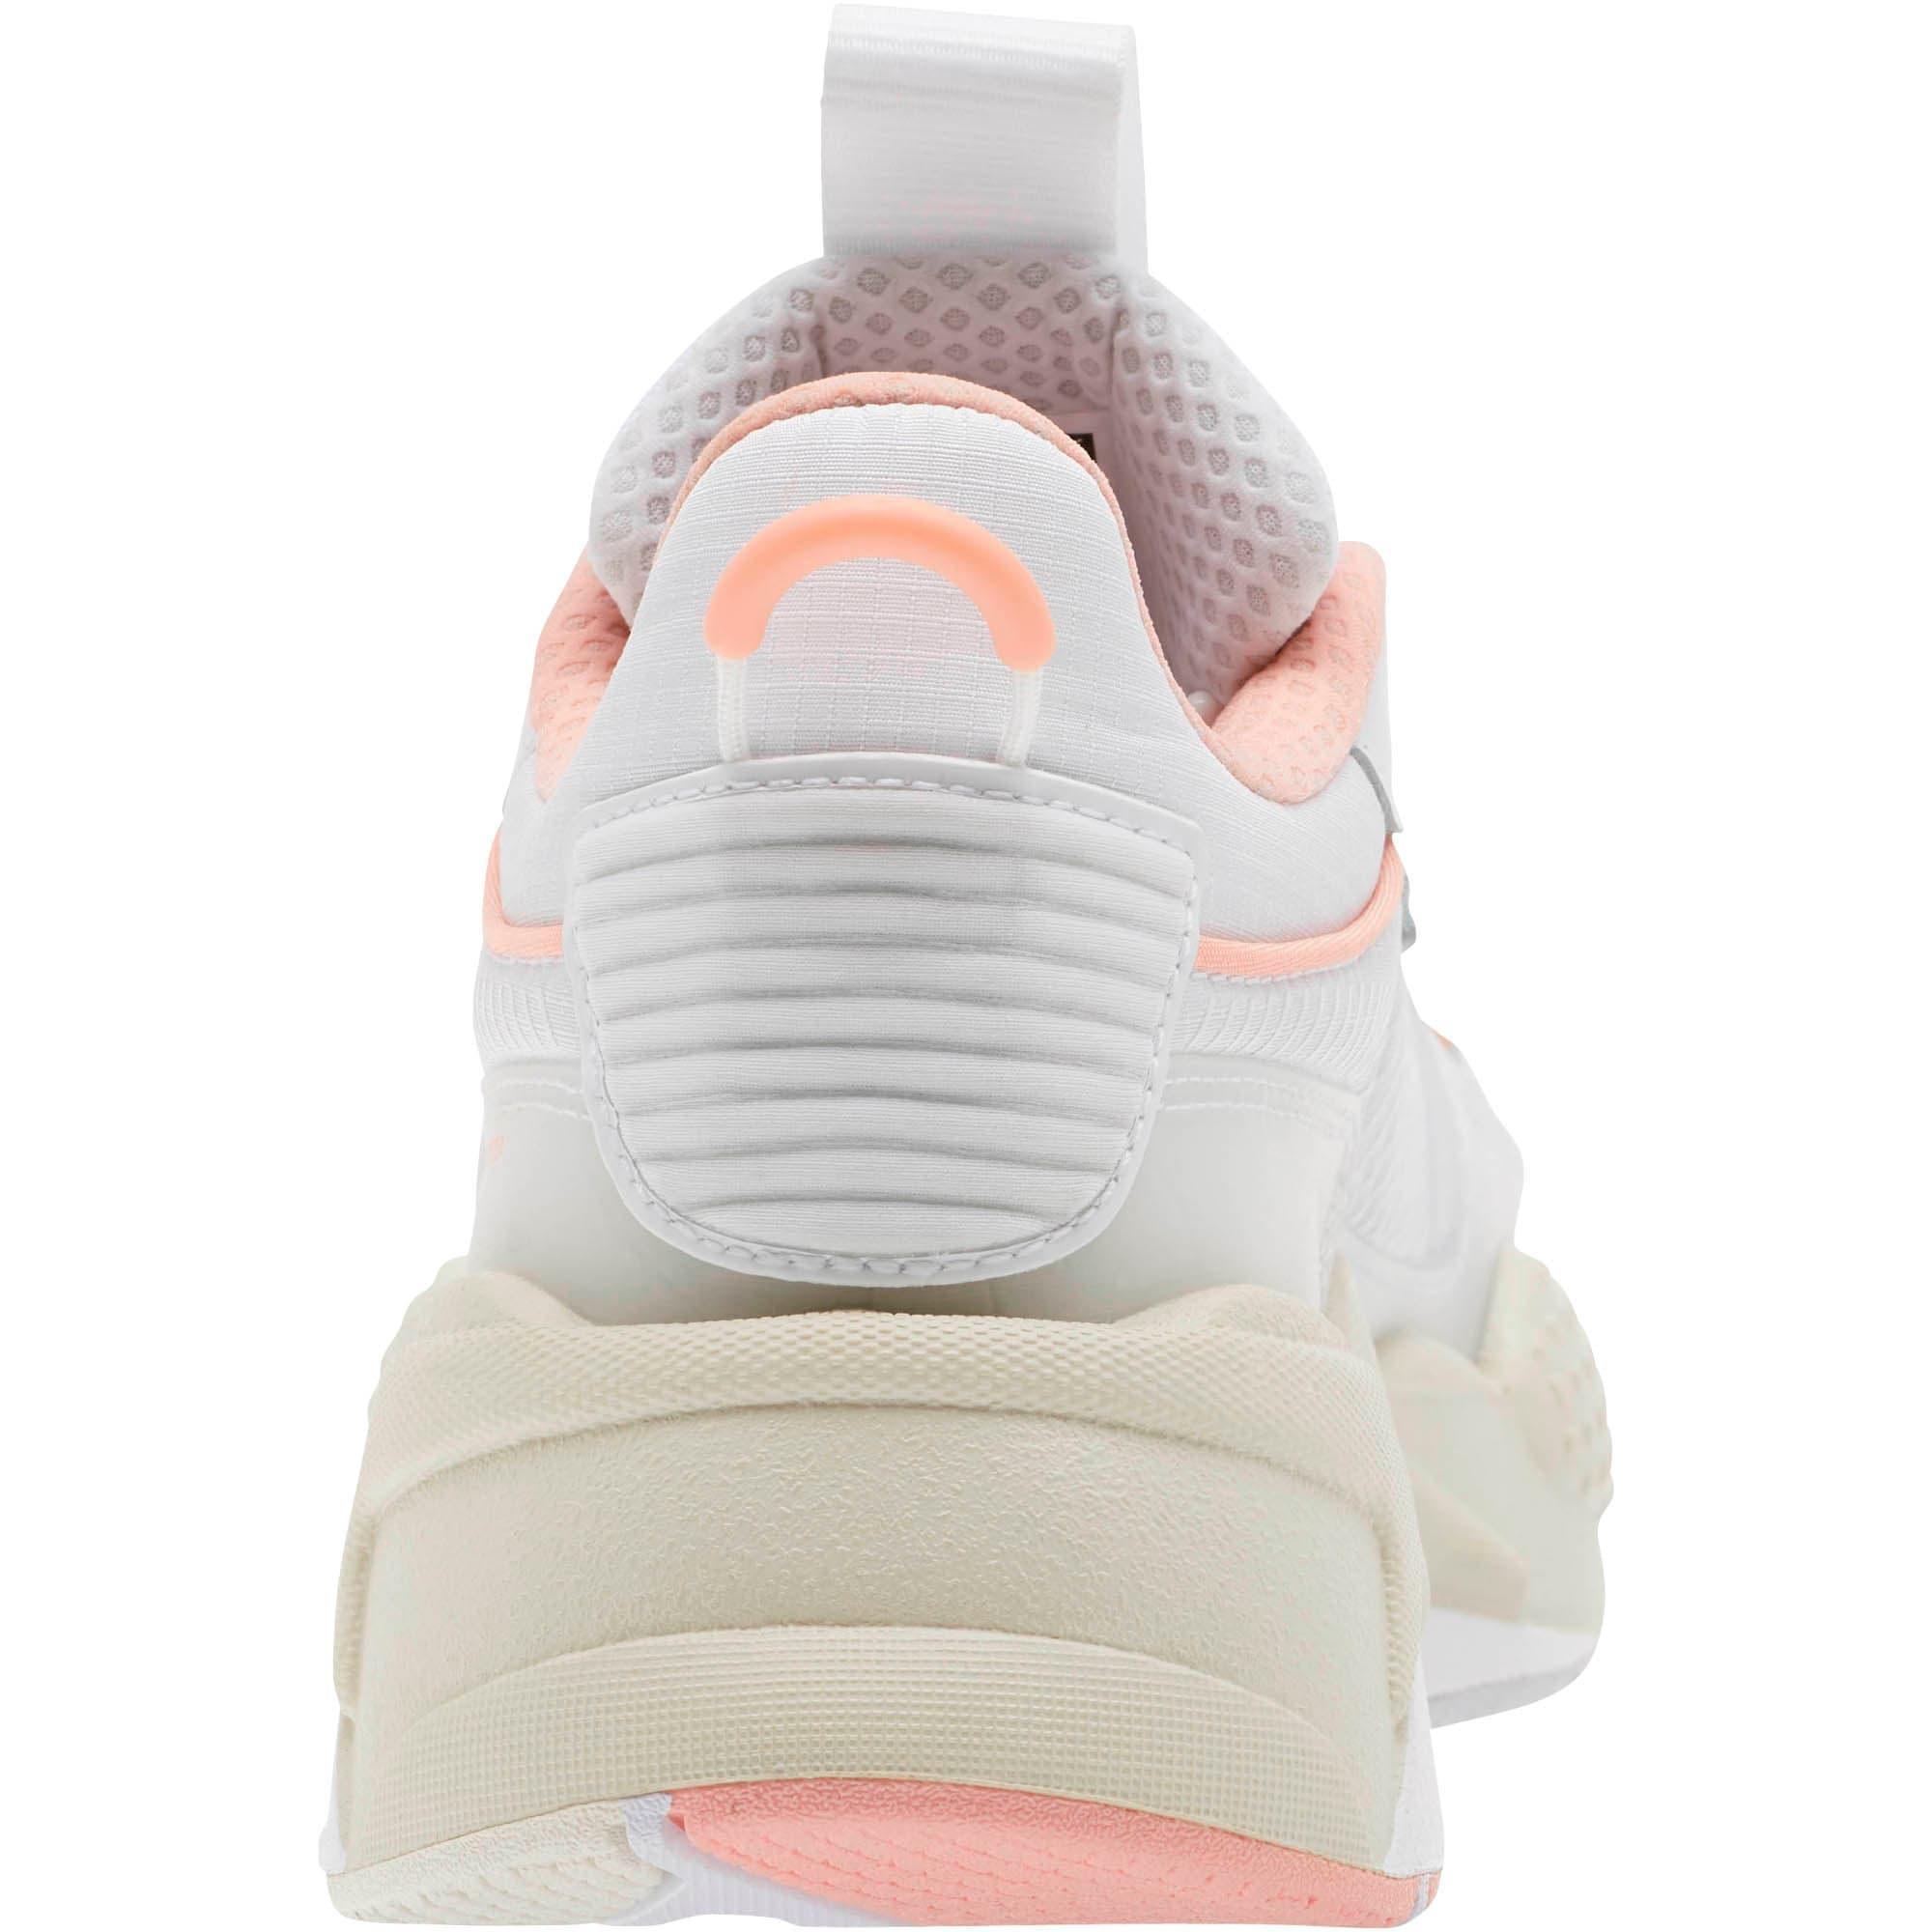 Thumbnail 3 of RS-X Tech Women's Sneakers, Puma White-Peach Bud, medium